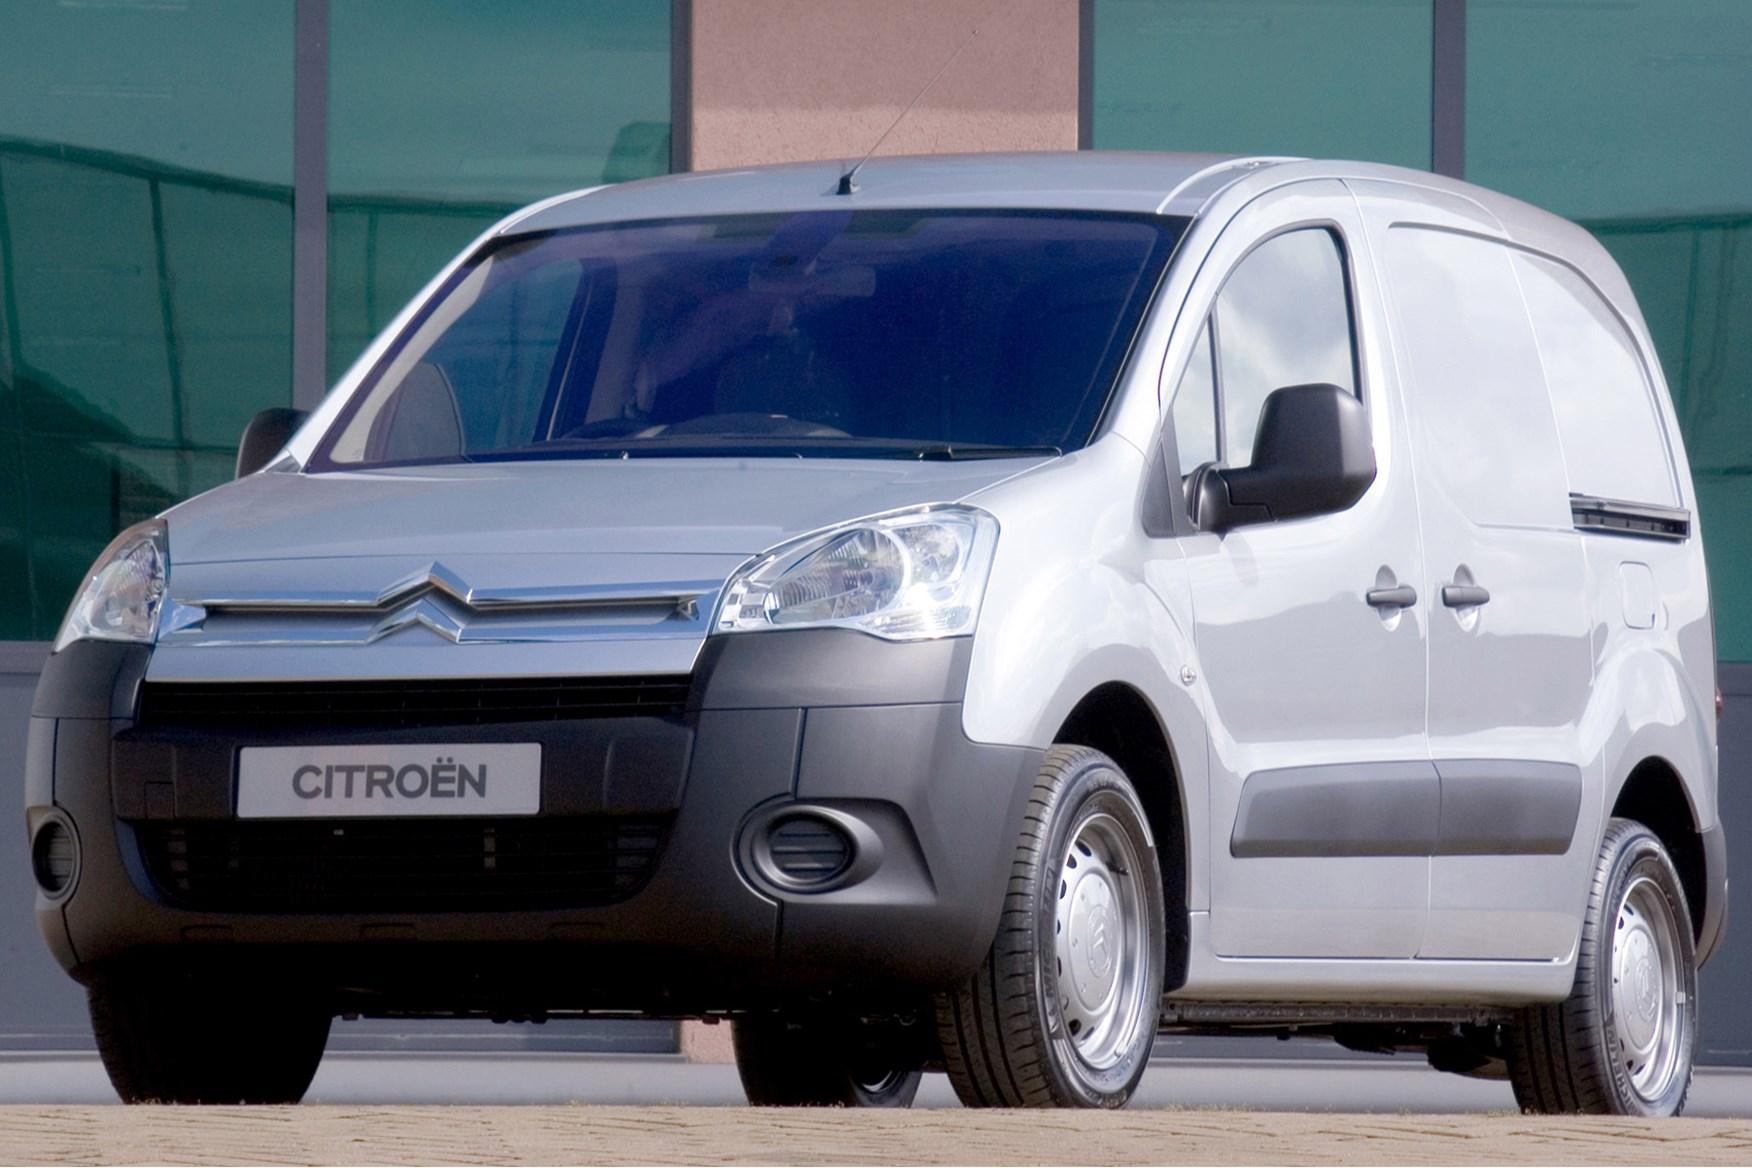 Citroen Berlingo full review on Parkers Vans - front